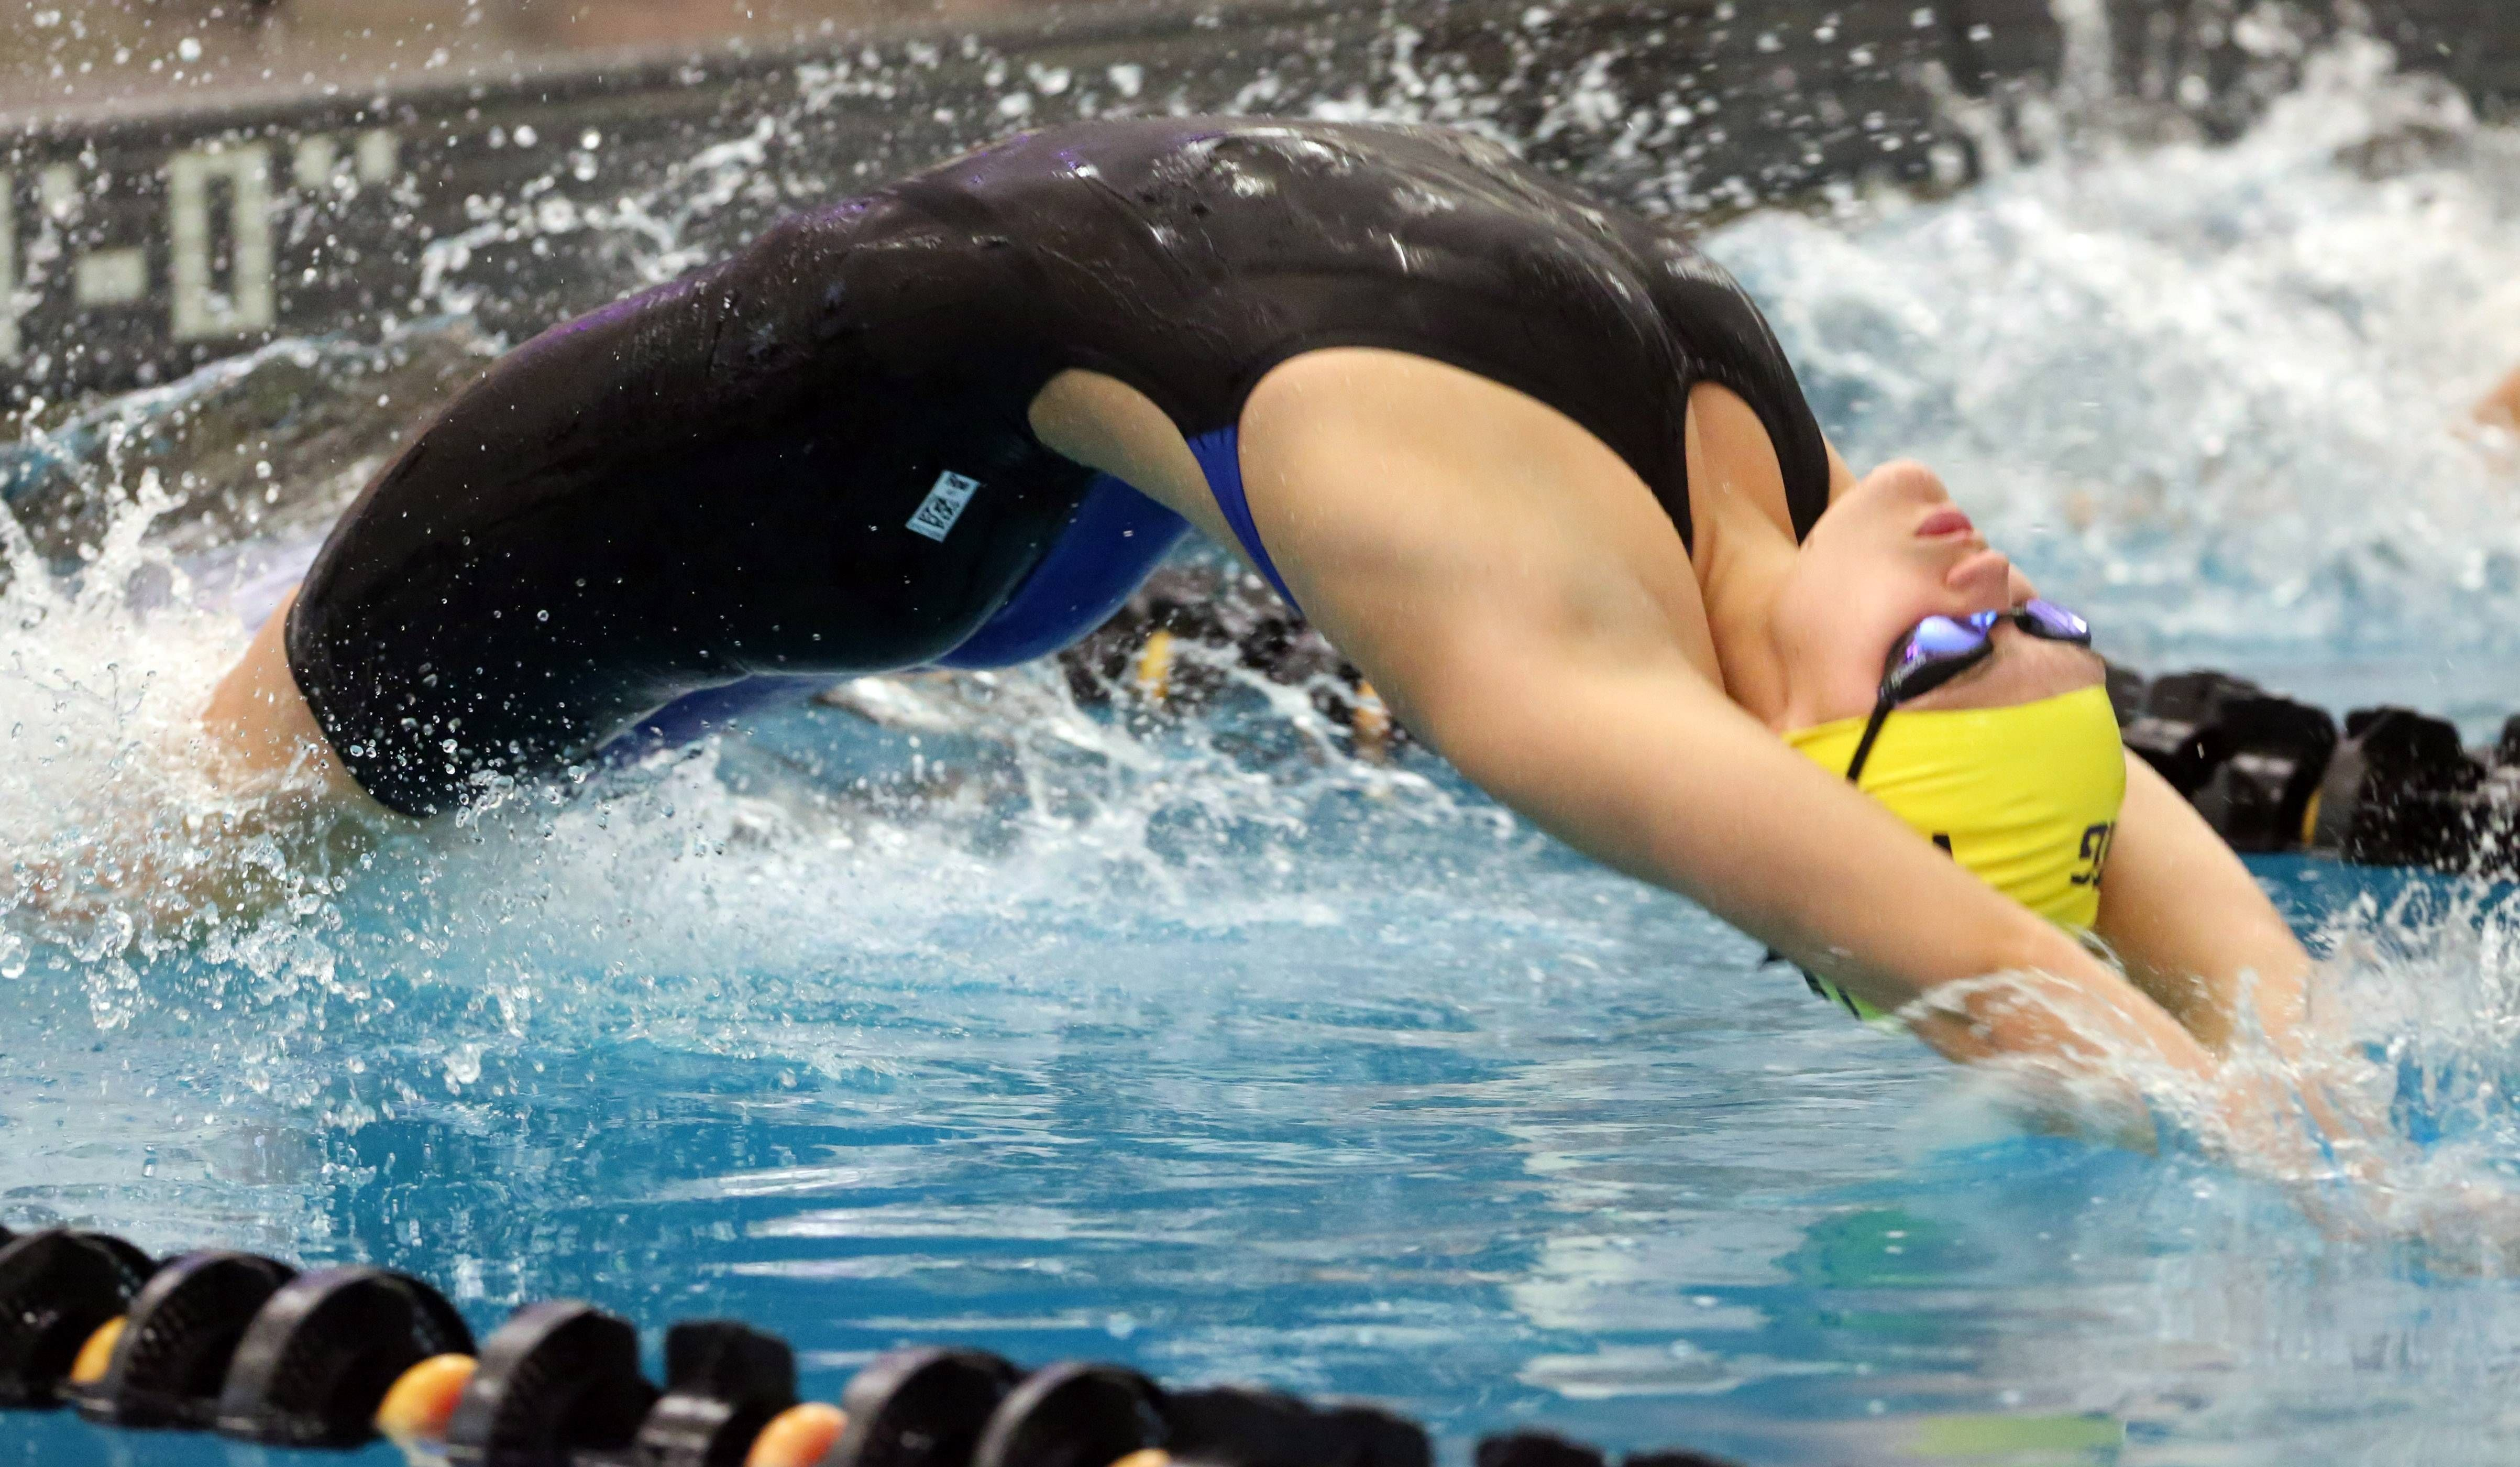 Wheeling's Theresa Godlewski starts her pool-record 100-yard backstroke (56.93) effort during the Mid-Suburban League girls swimming meet on Saturday at Barrington.